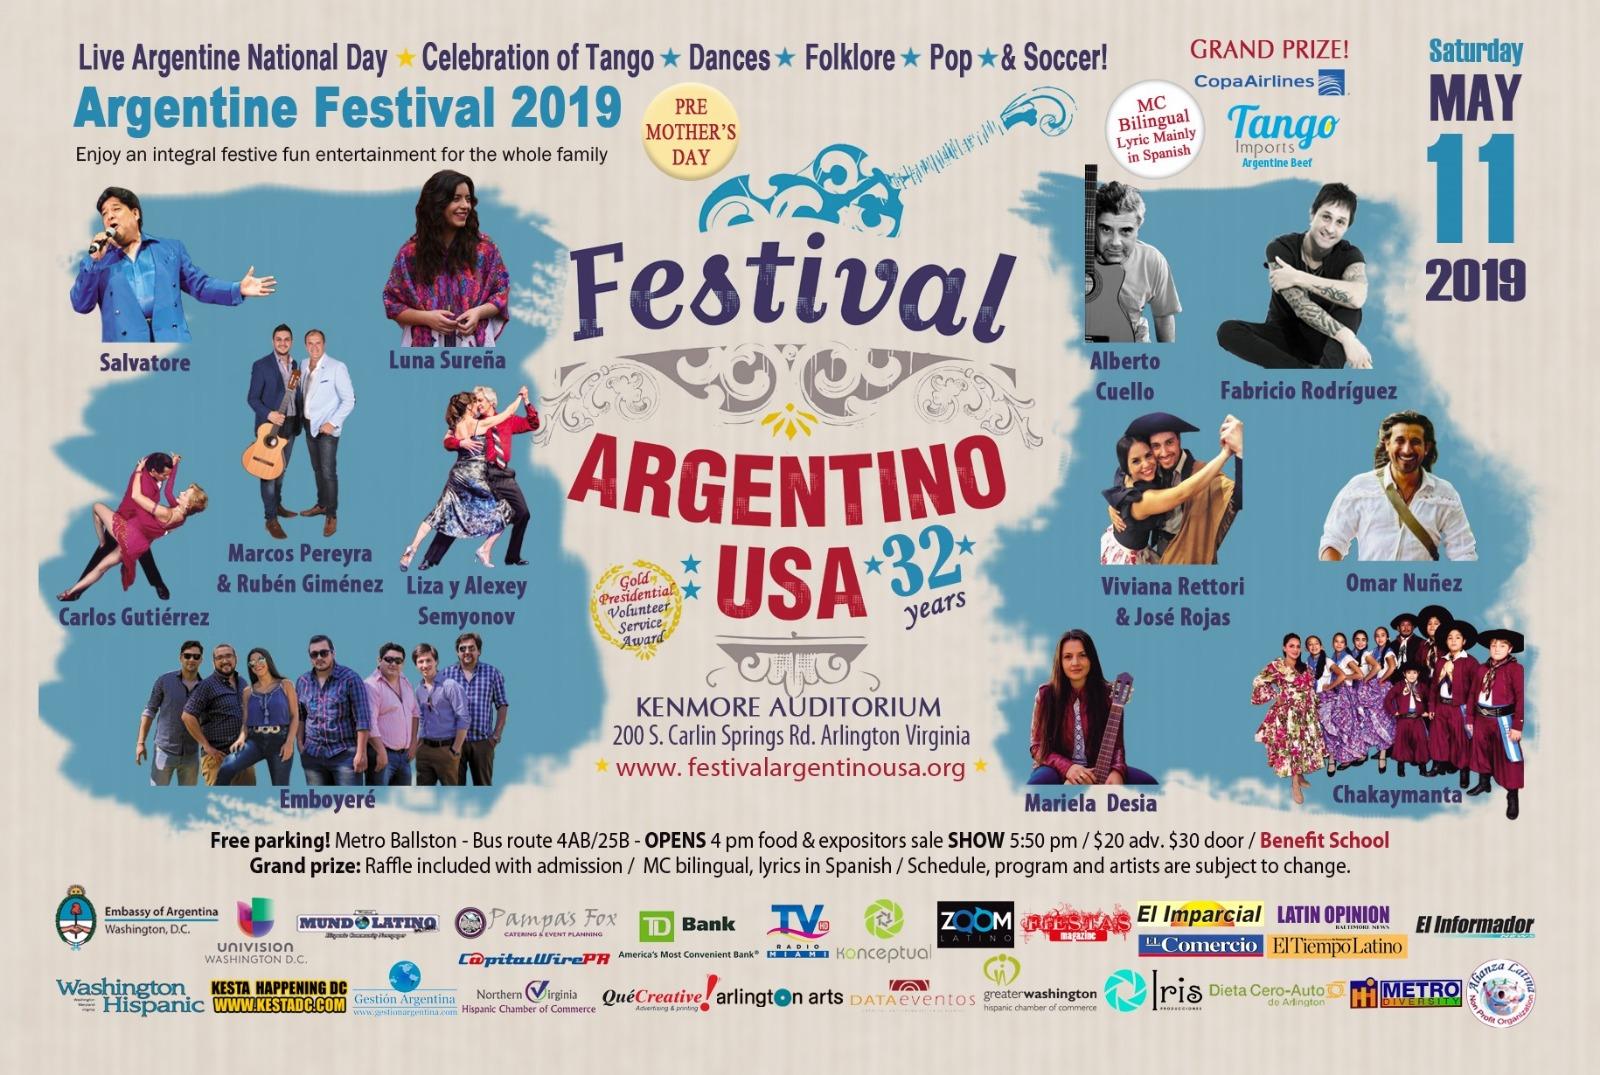 Festival Argentino USA » Tango, dances, folcklore, pop and more!